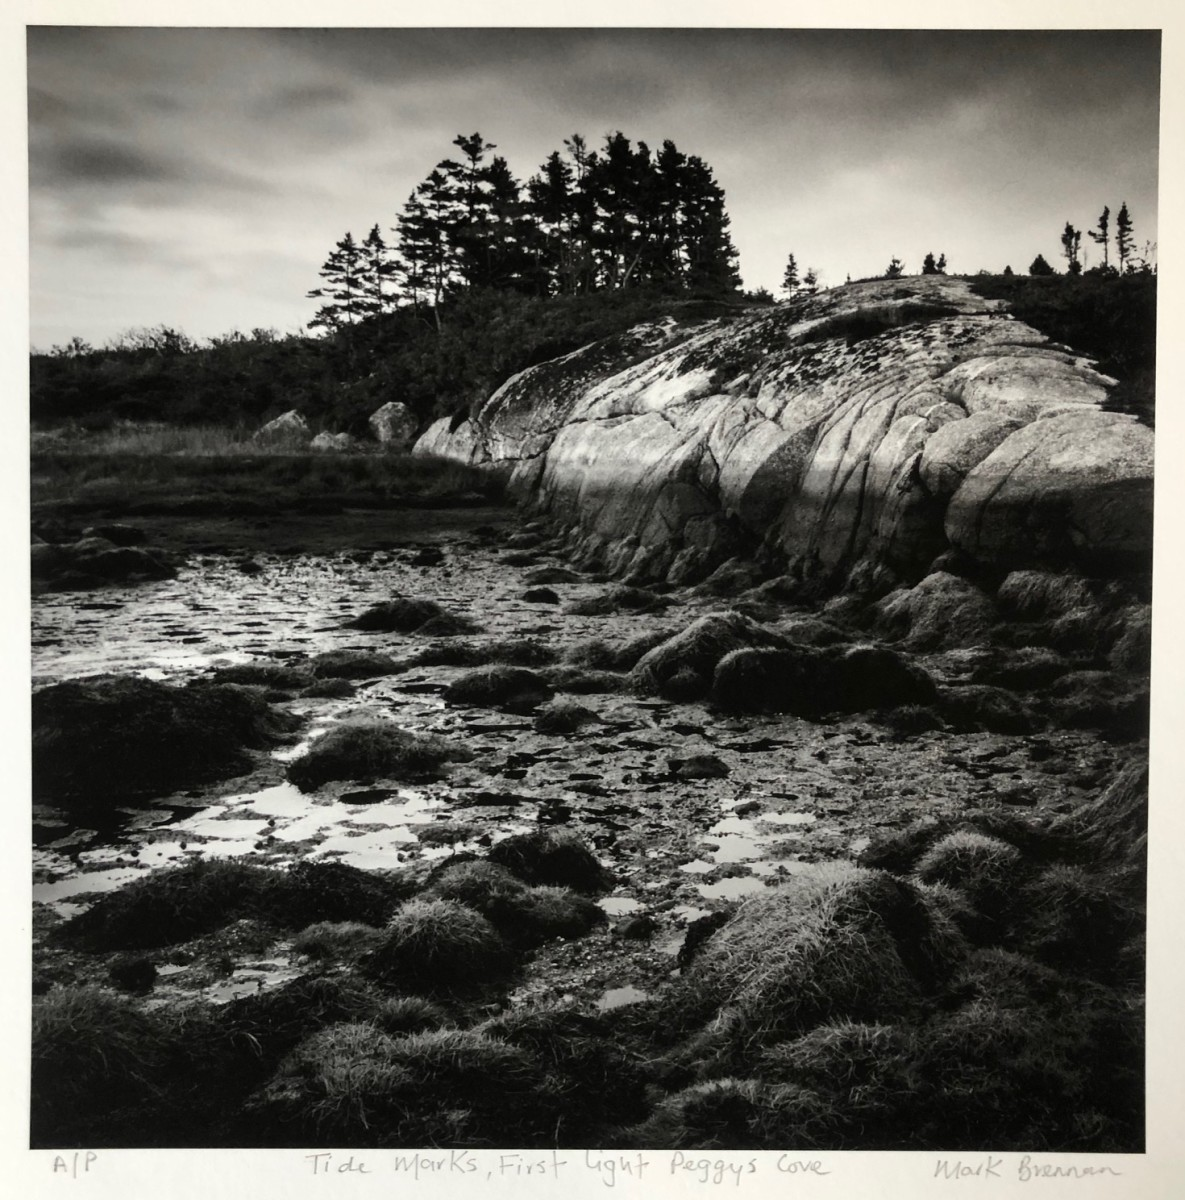 Tide Marks, First Light, Peggys Cove, Nova Scotia by Mark Brennan